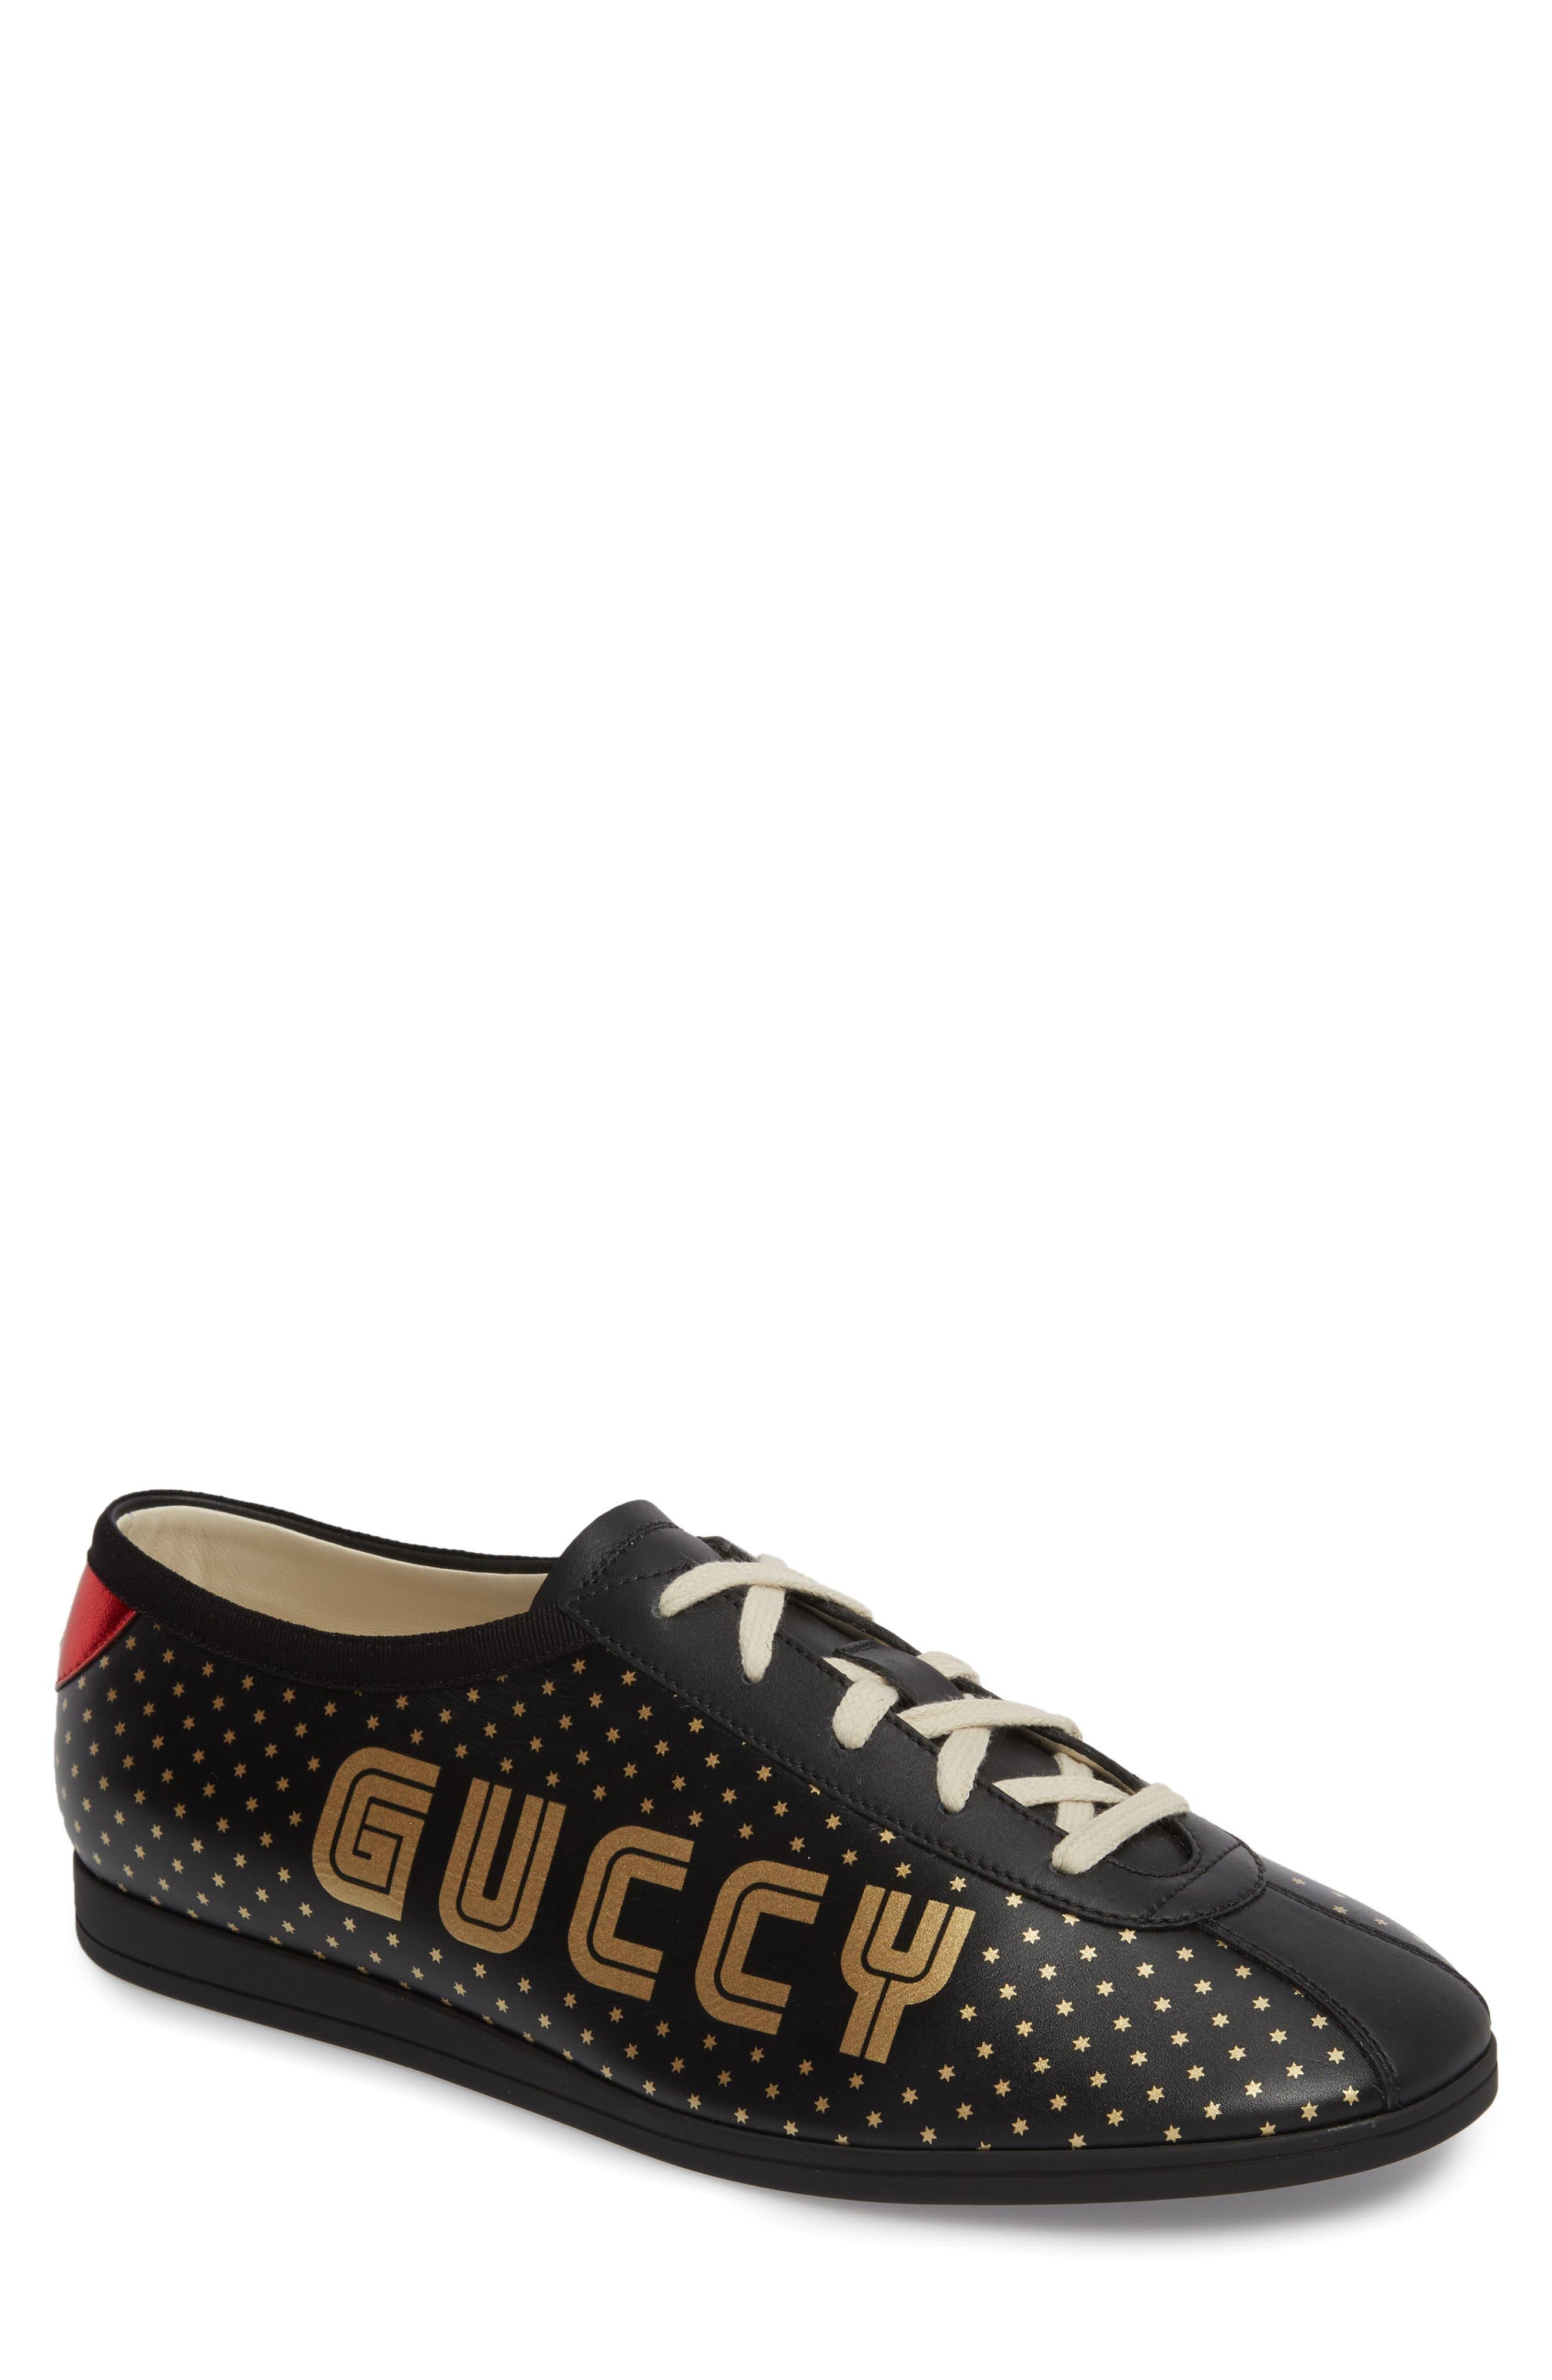 Falacer Guccy Print Sneaker,                             Main thumbnail 1, color,                             BLACK/ TAN